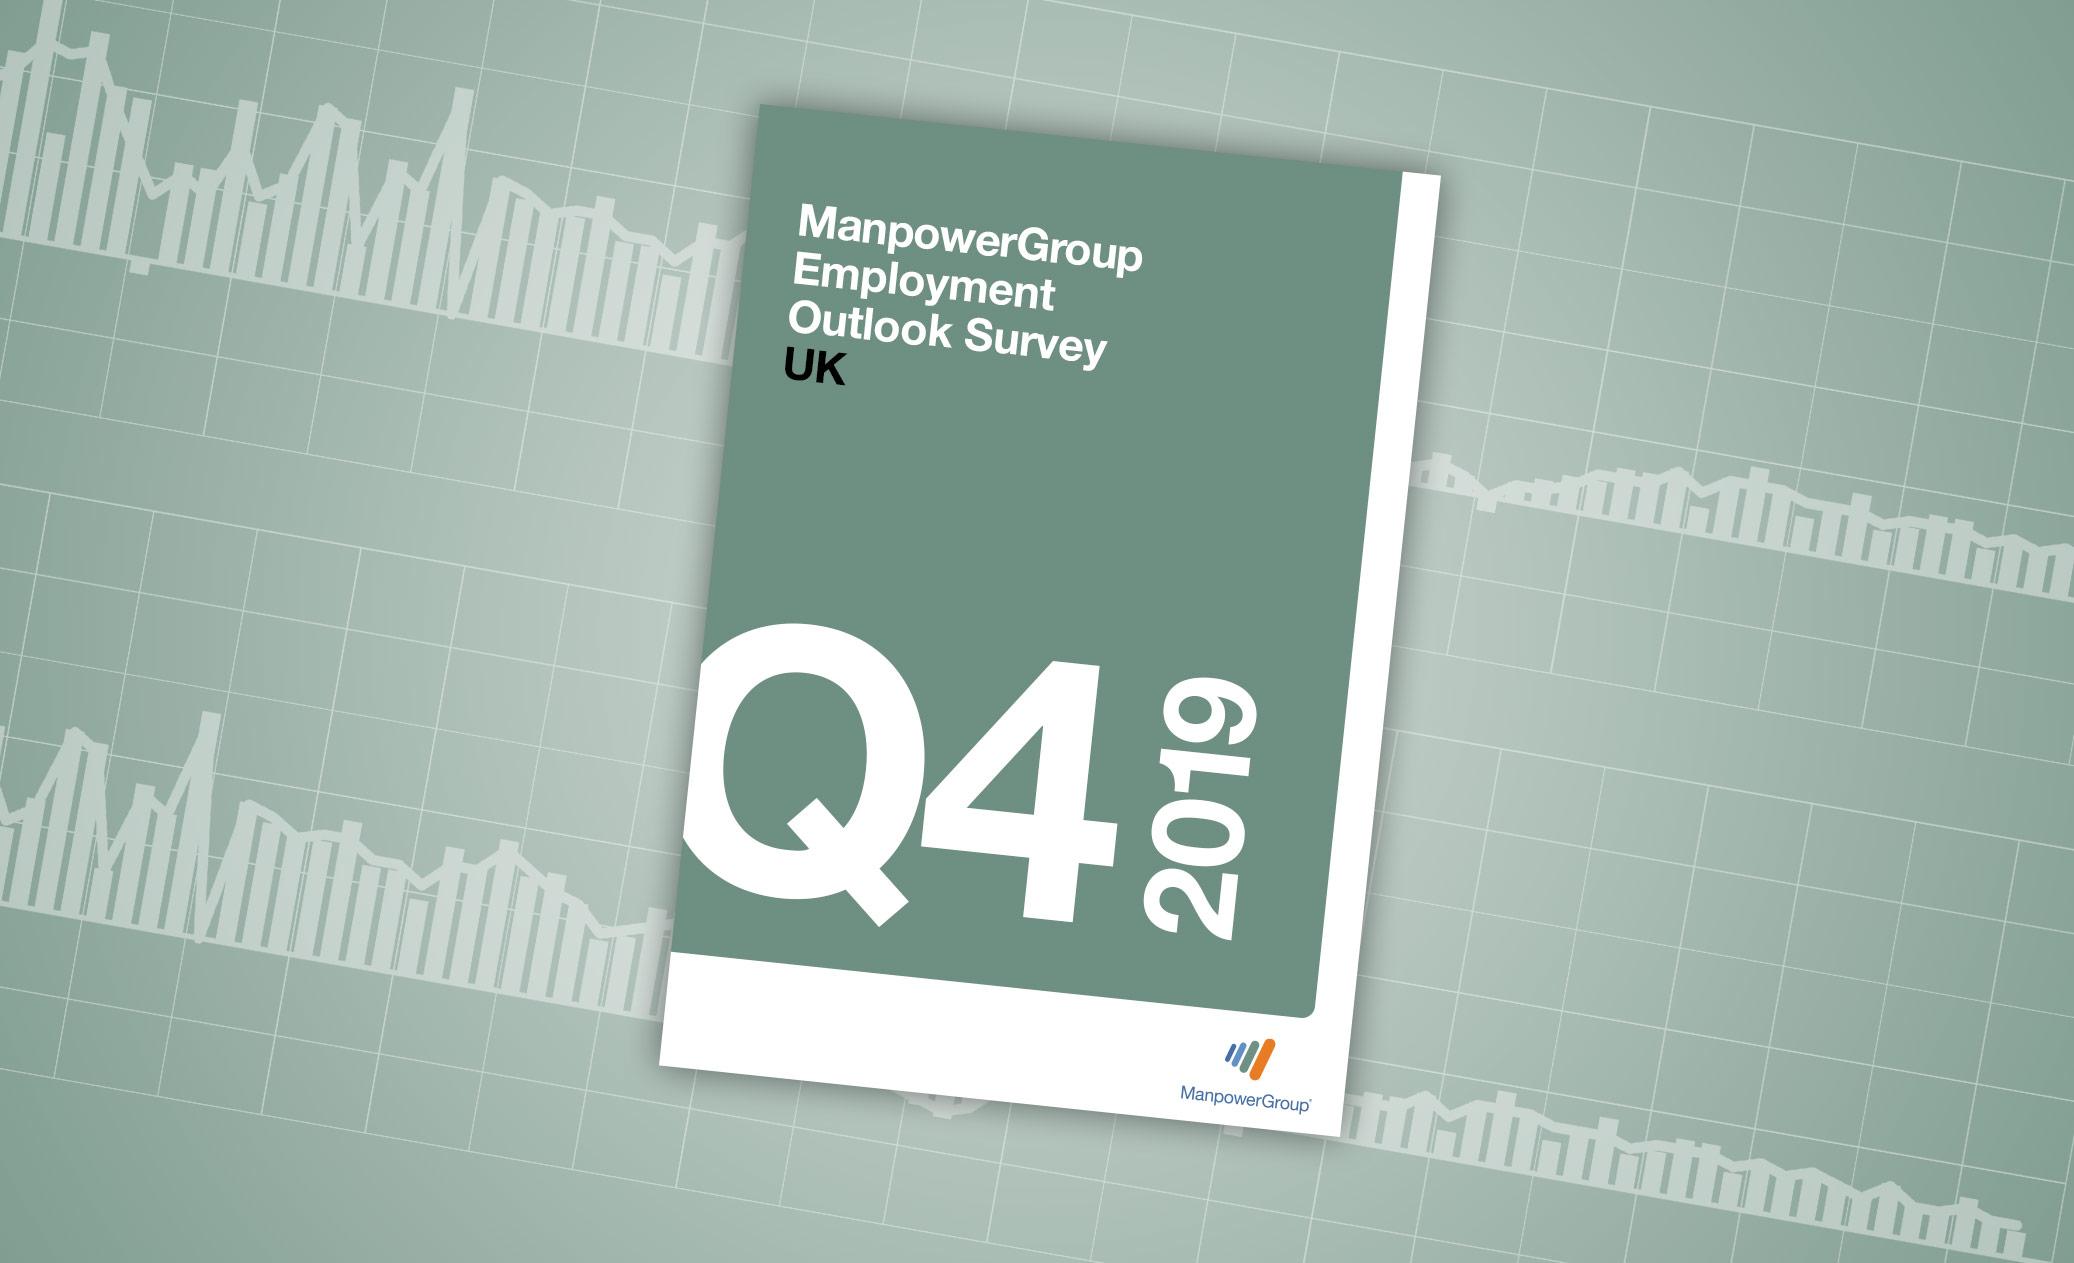 ManpowerGroup Employment Outlook Survey – Q4 2019